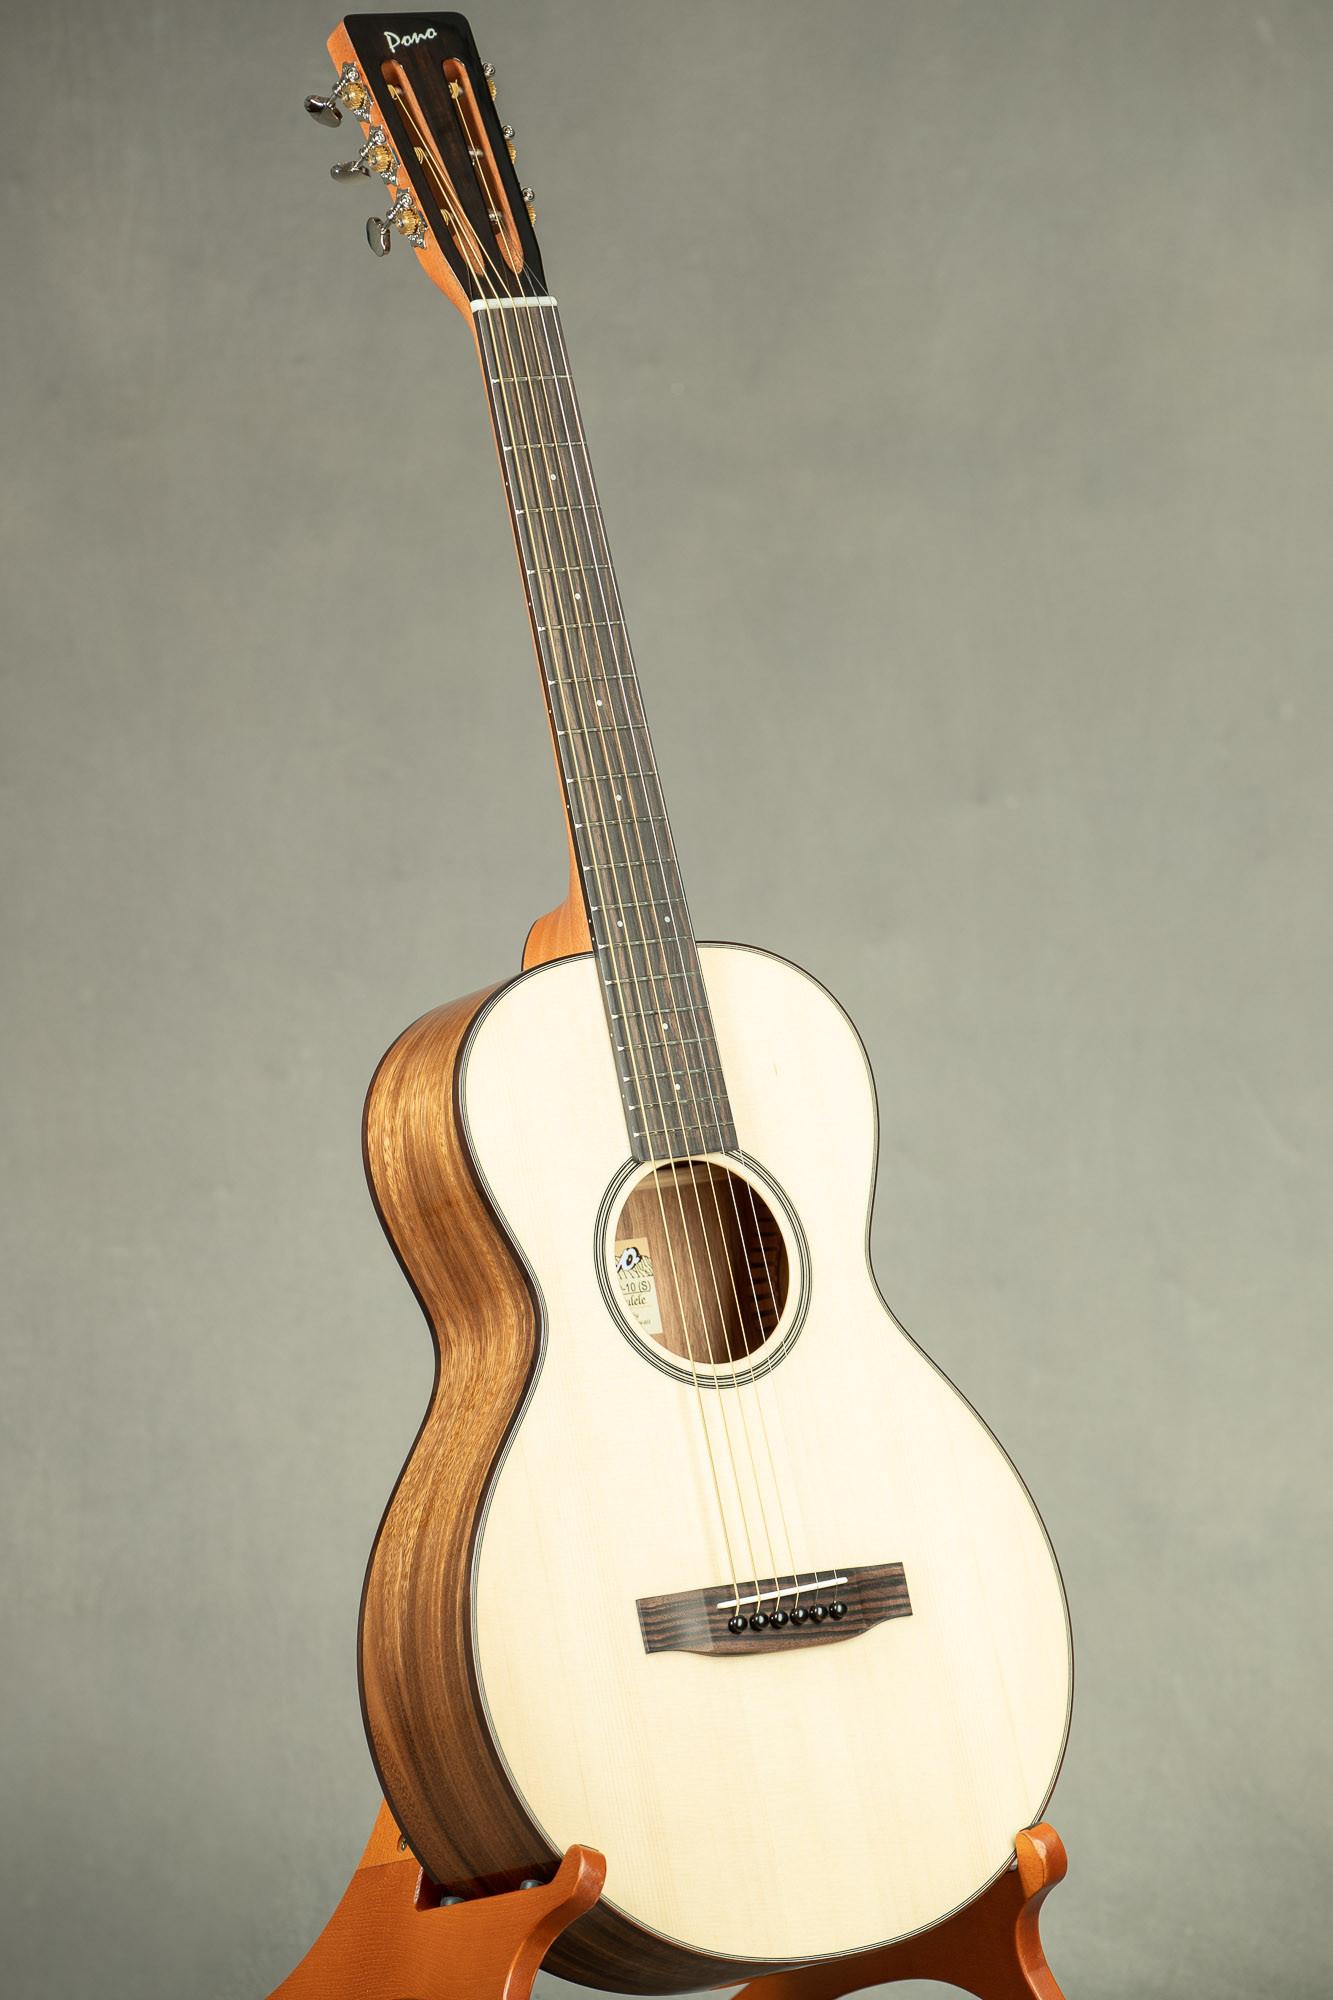 Pono Spruce Top Acacia Single O Steel String Guitar (O-10S 3215)